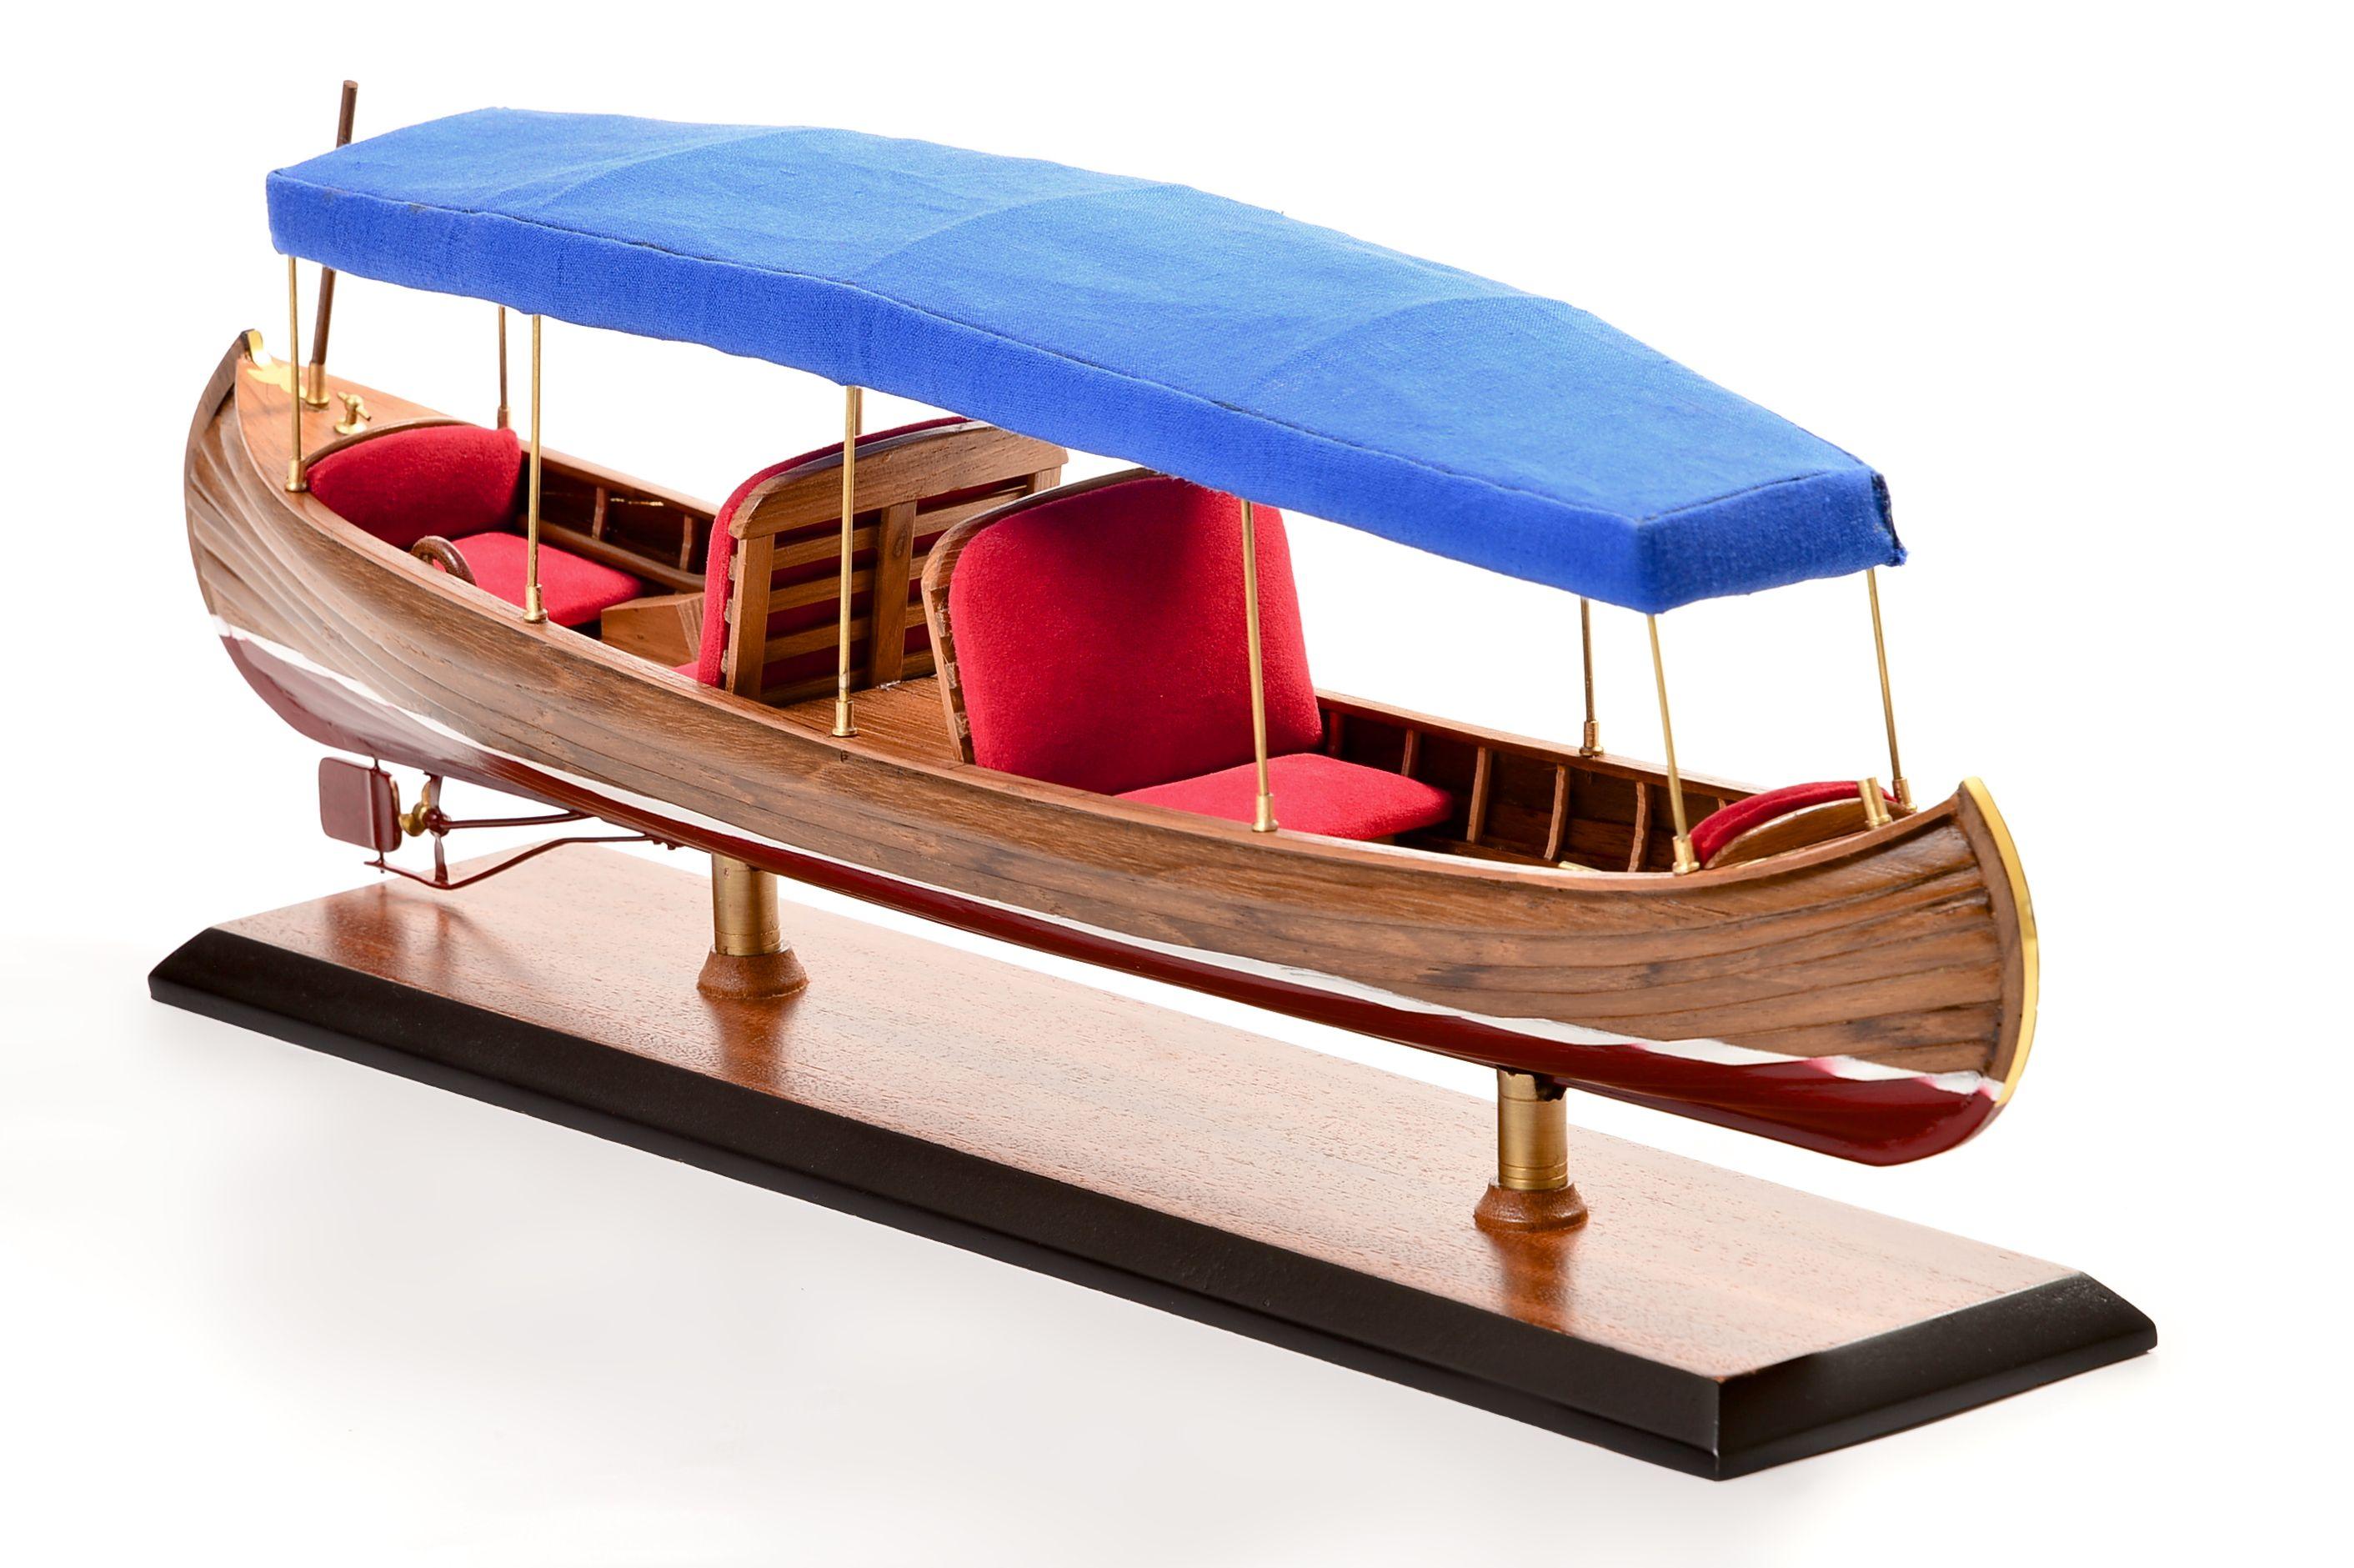 1865-11251-Liddesdale-Electric-Canoe-1920